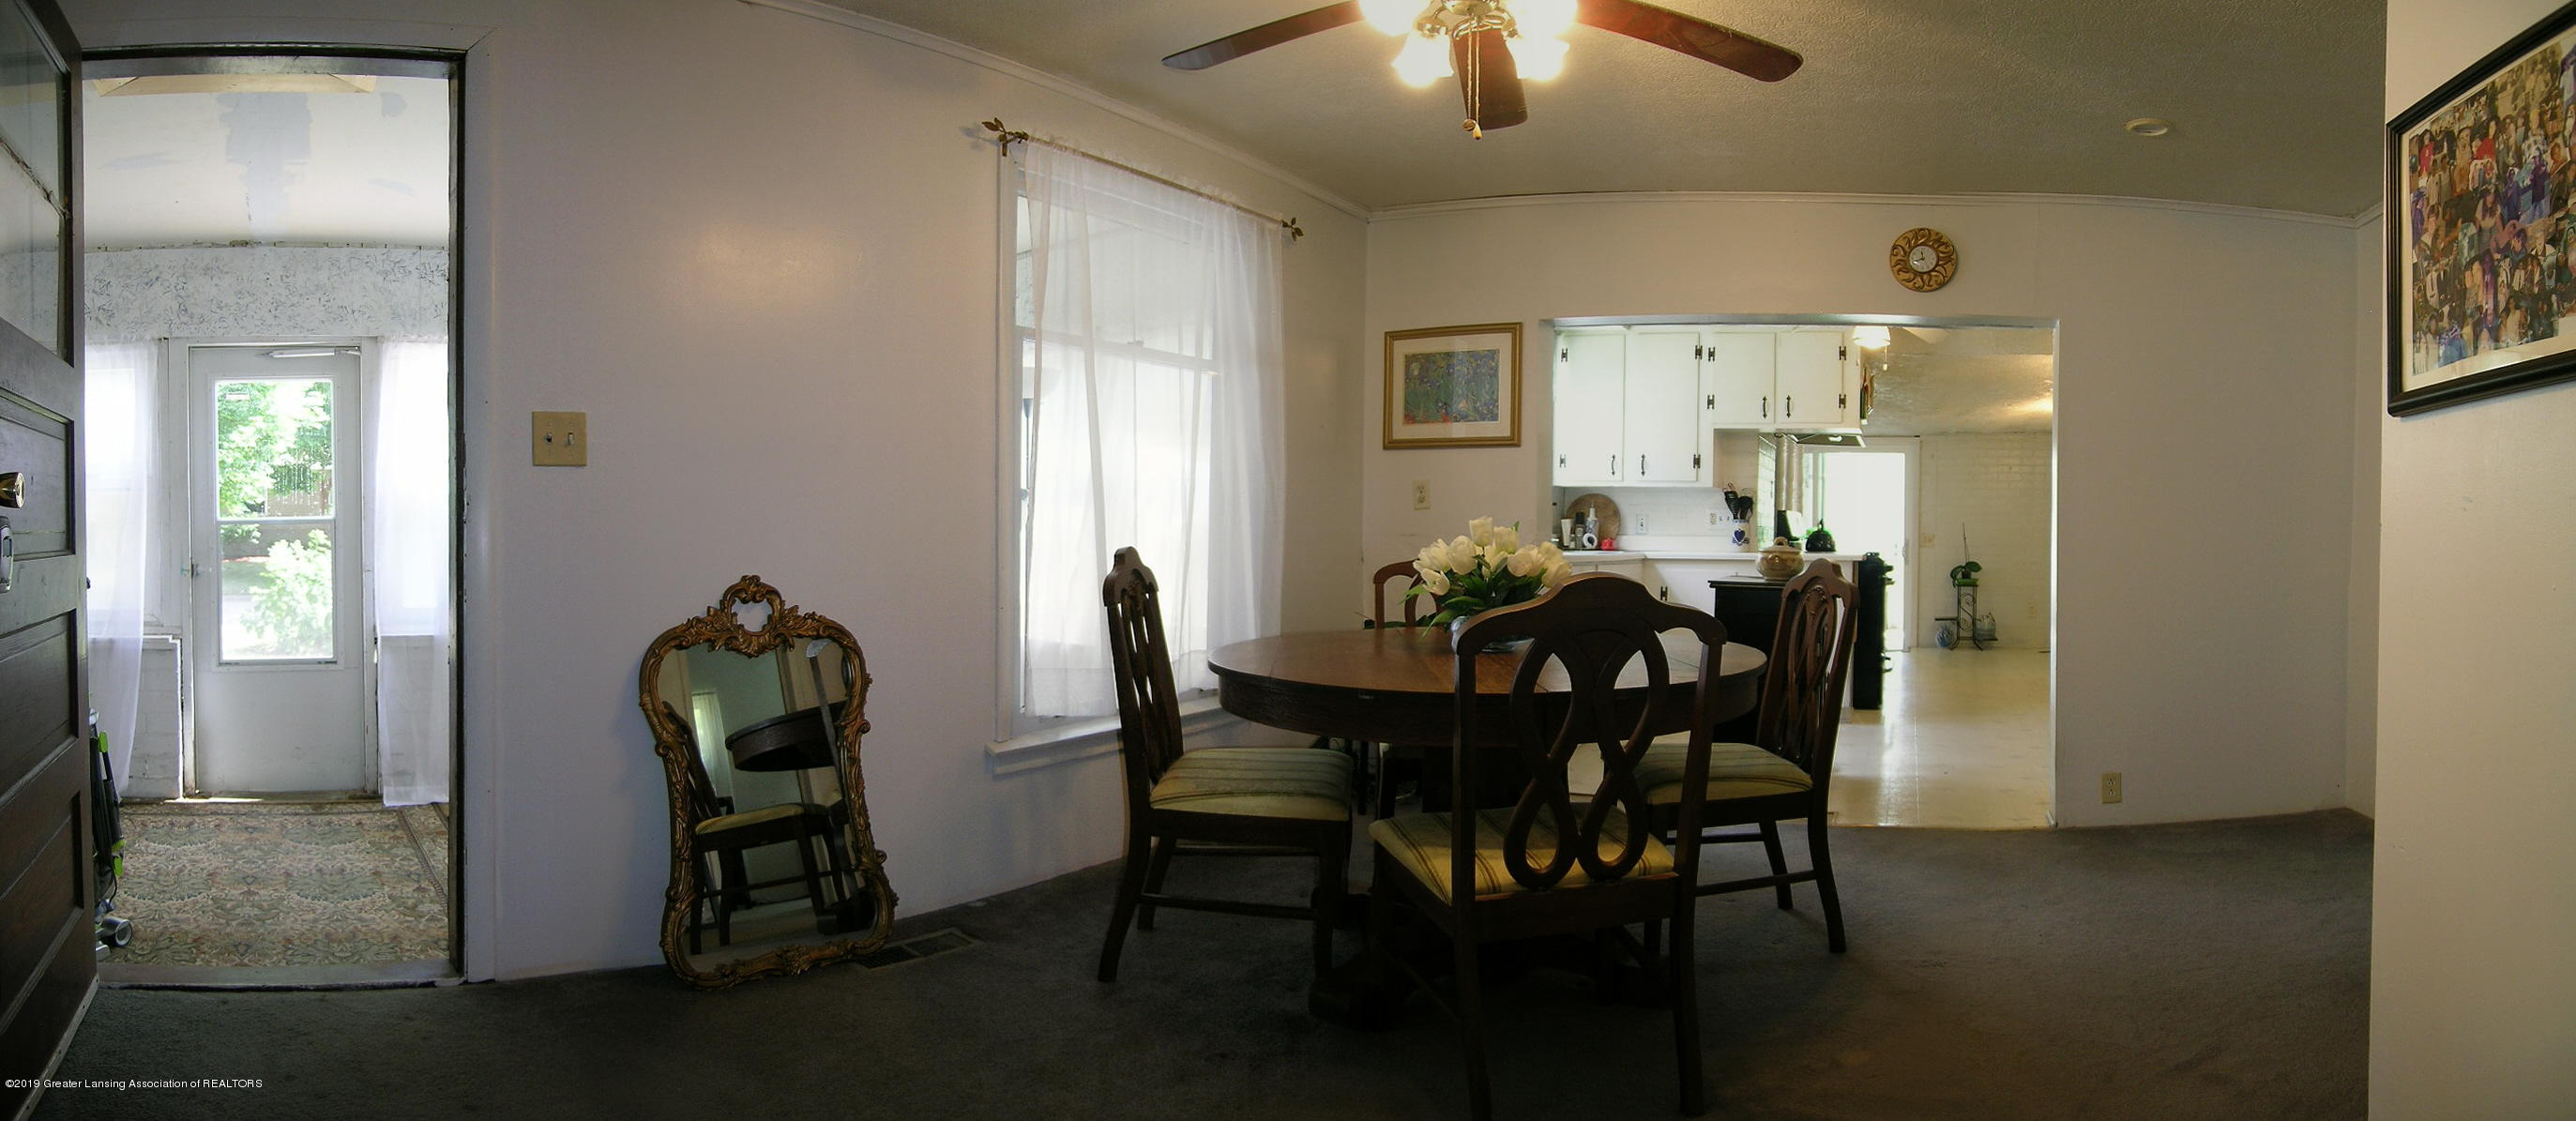 413 W Shepherd St - Dining Room - 4